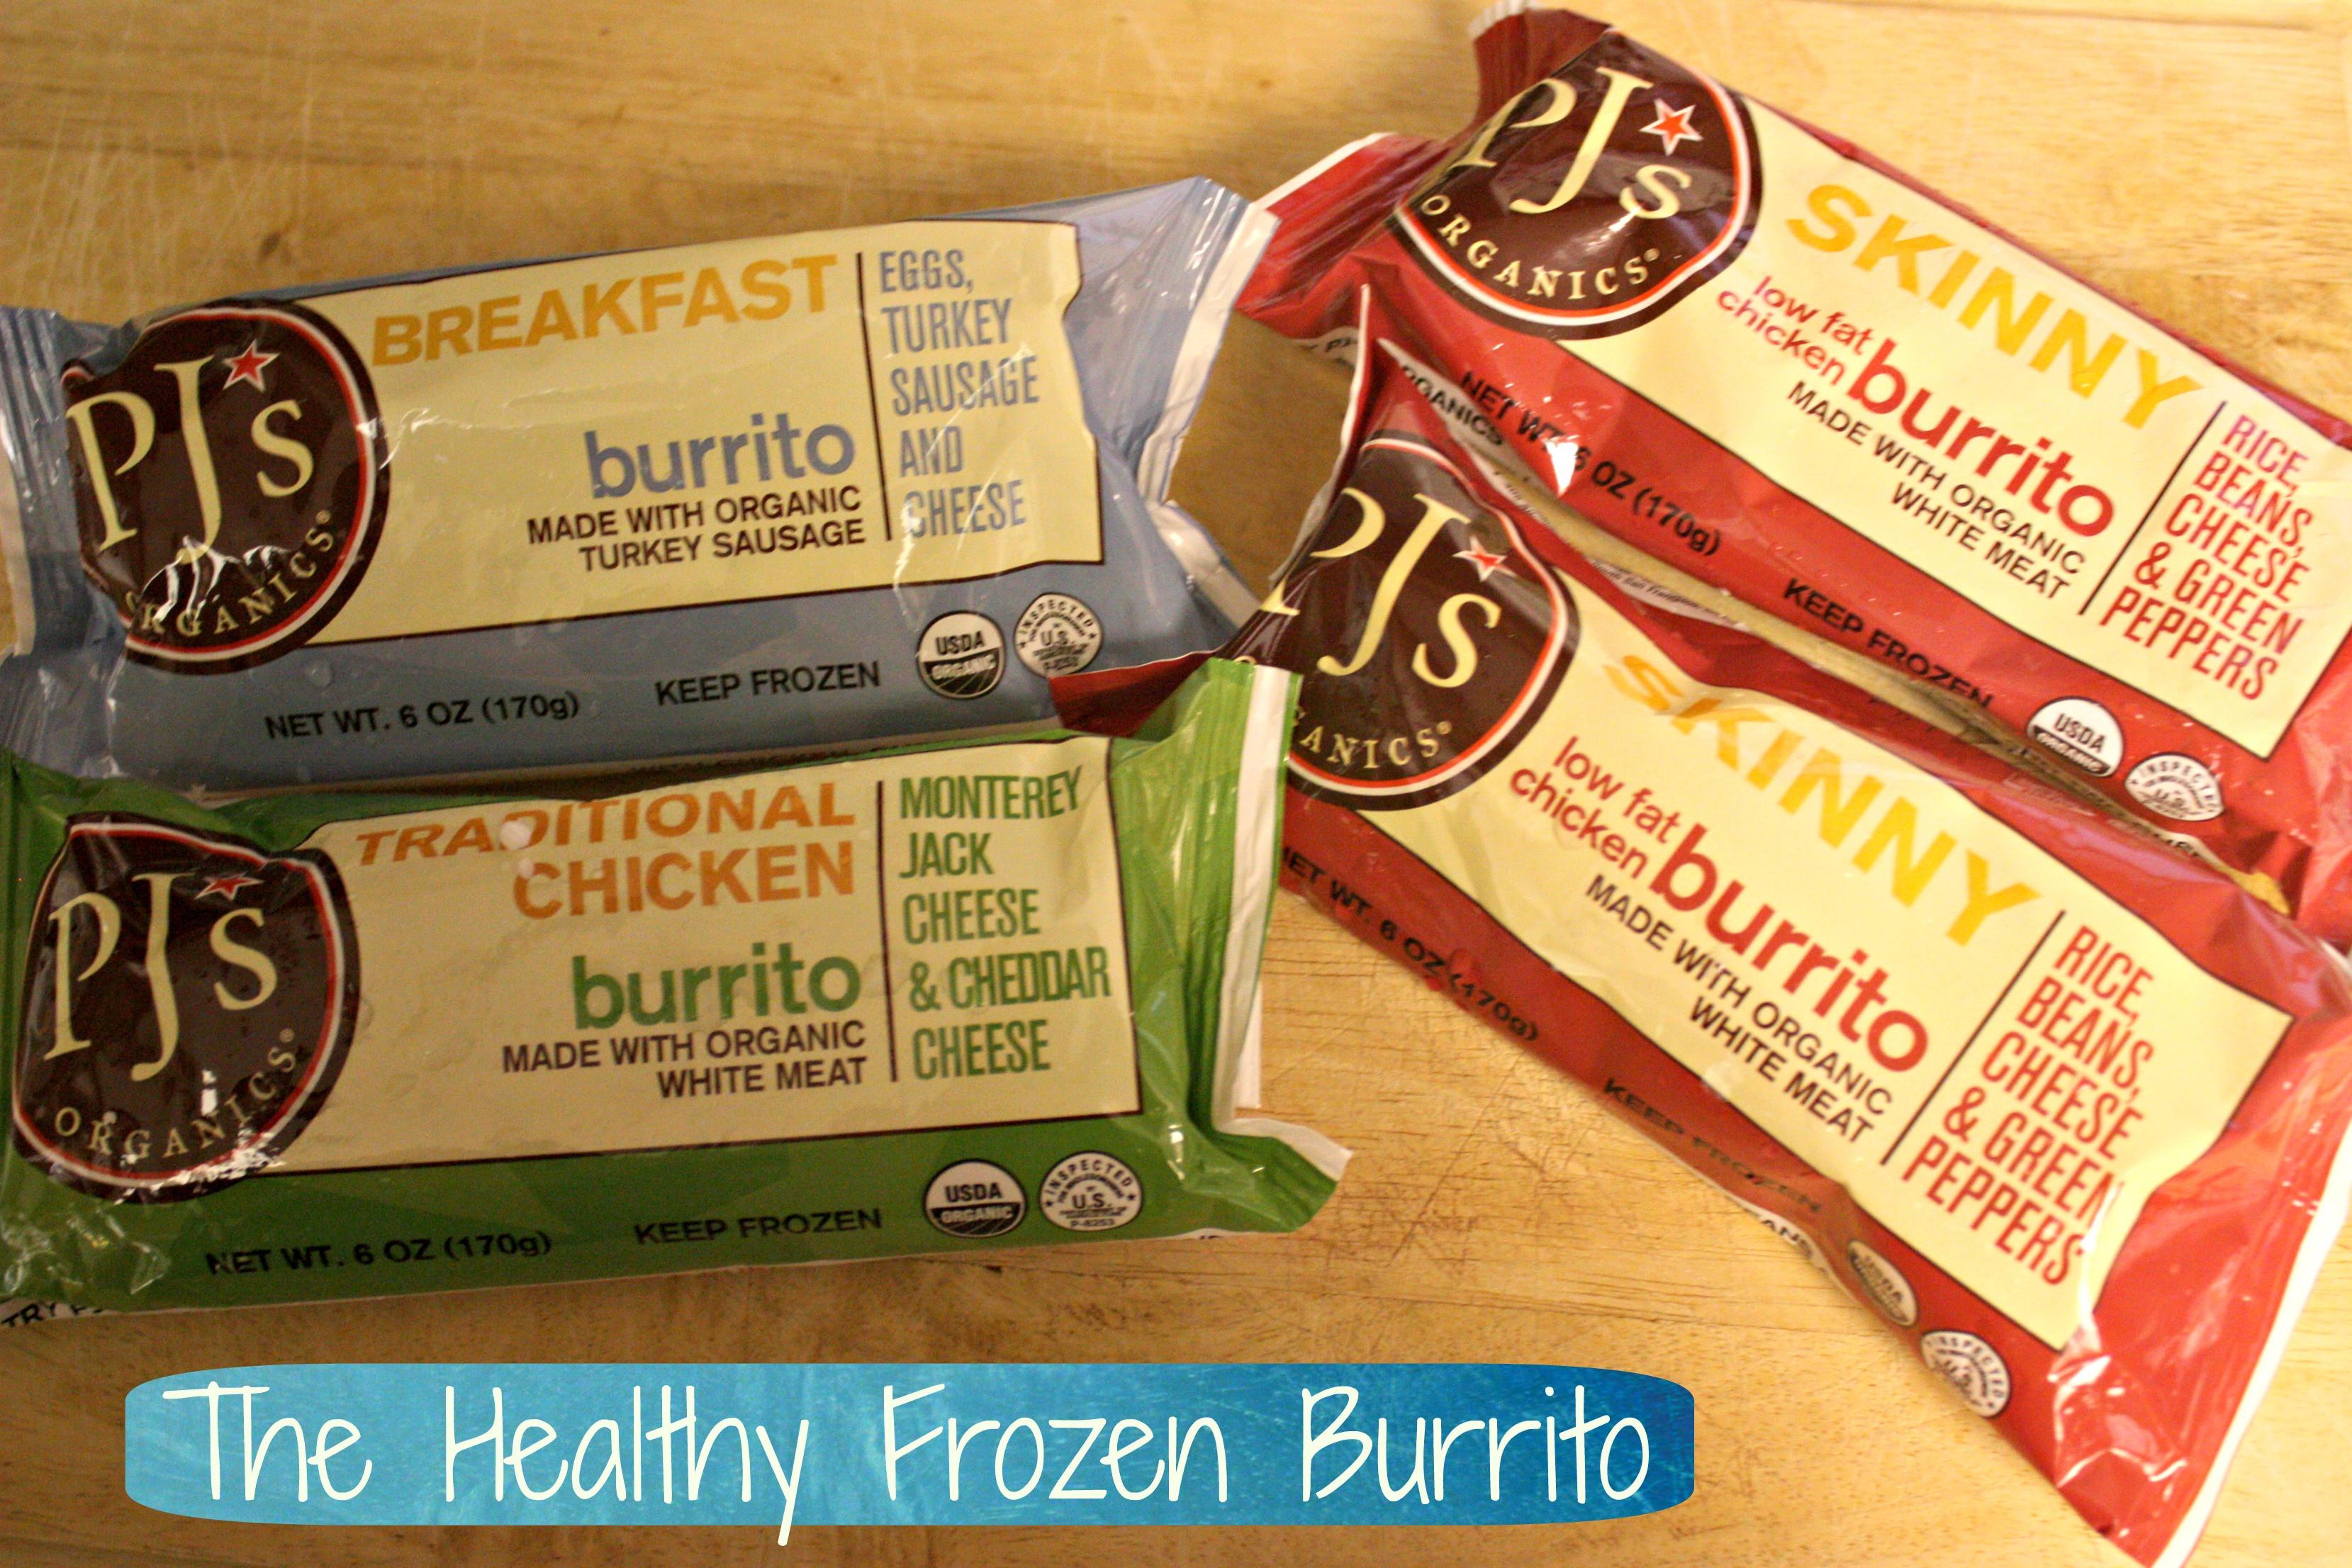 Pjs Organic Burritos  PJ's Organic Frozen Burrito Review